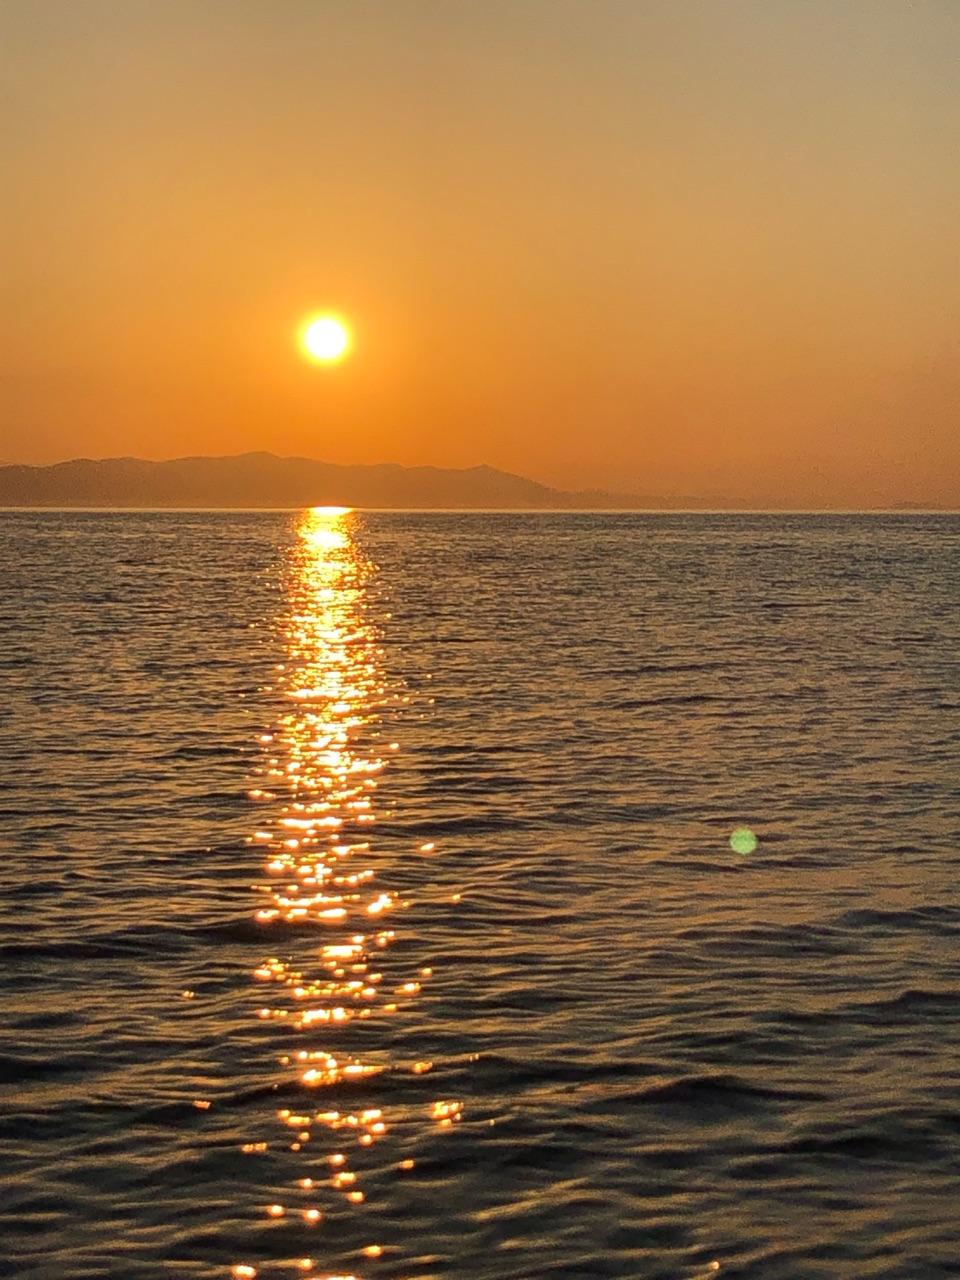 Croatia, Island, and sunset image